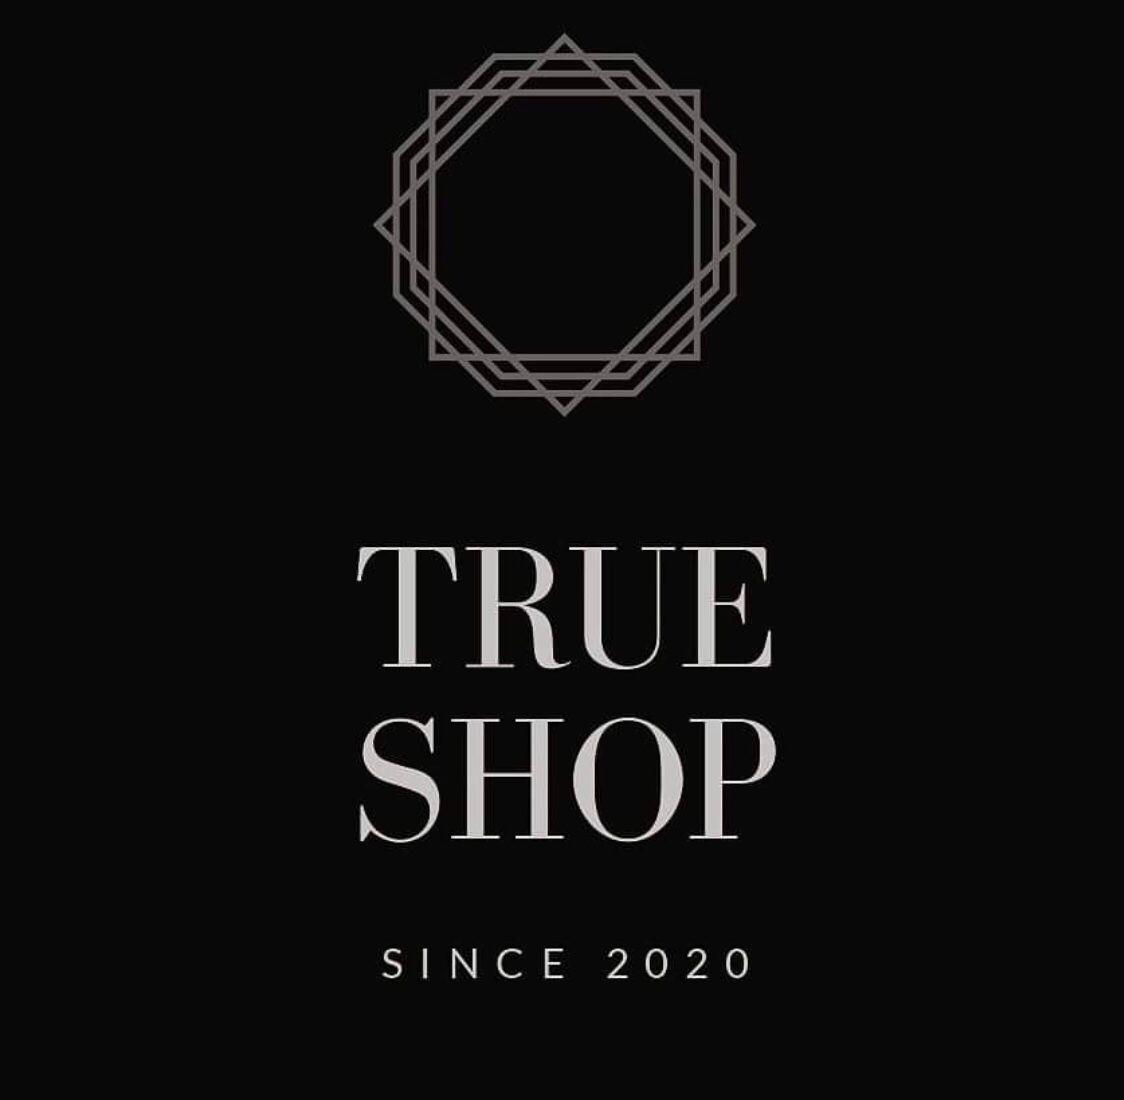 TrueShop